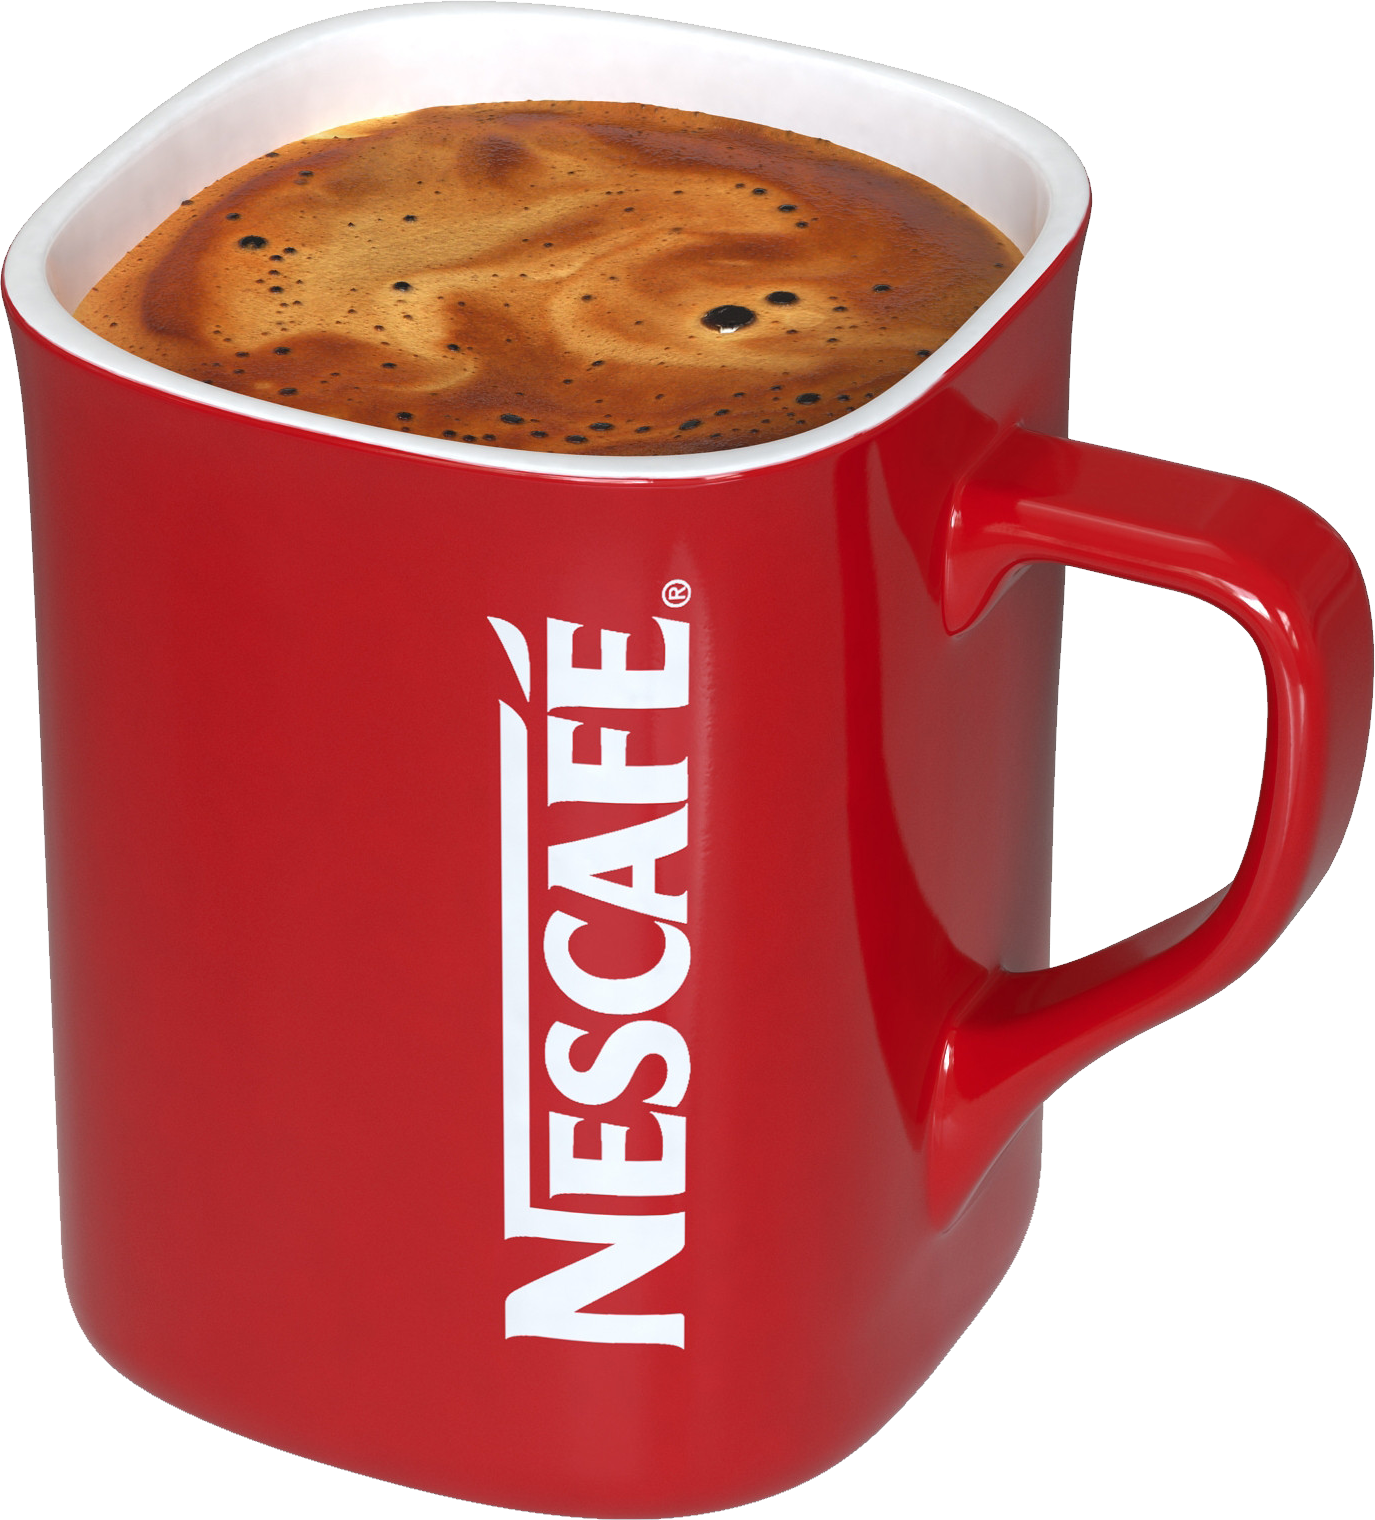 Nescafe Red Mug Coffee Png Coffee Png Nescafe Red Mug